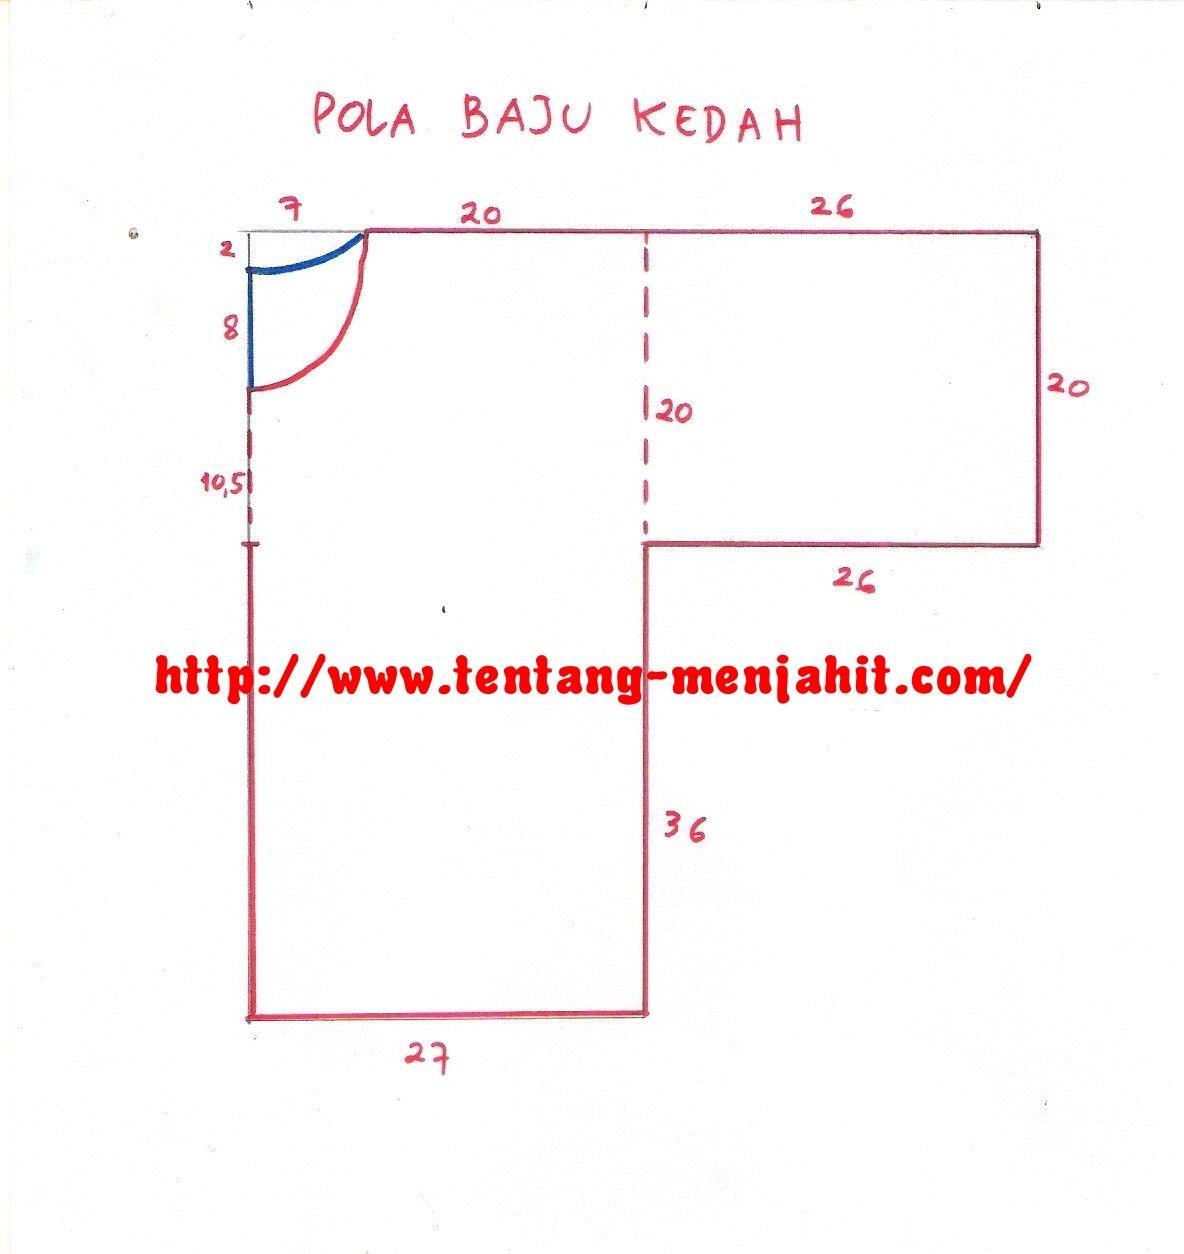 Simplest pattern for baju opah   Pattern baju kurung kedah   Pinterest